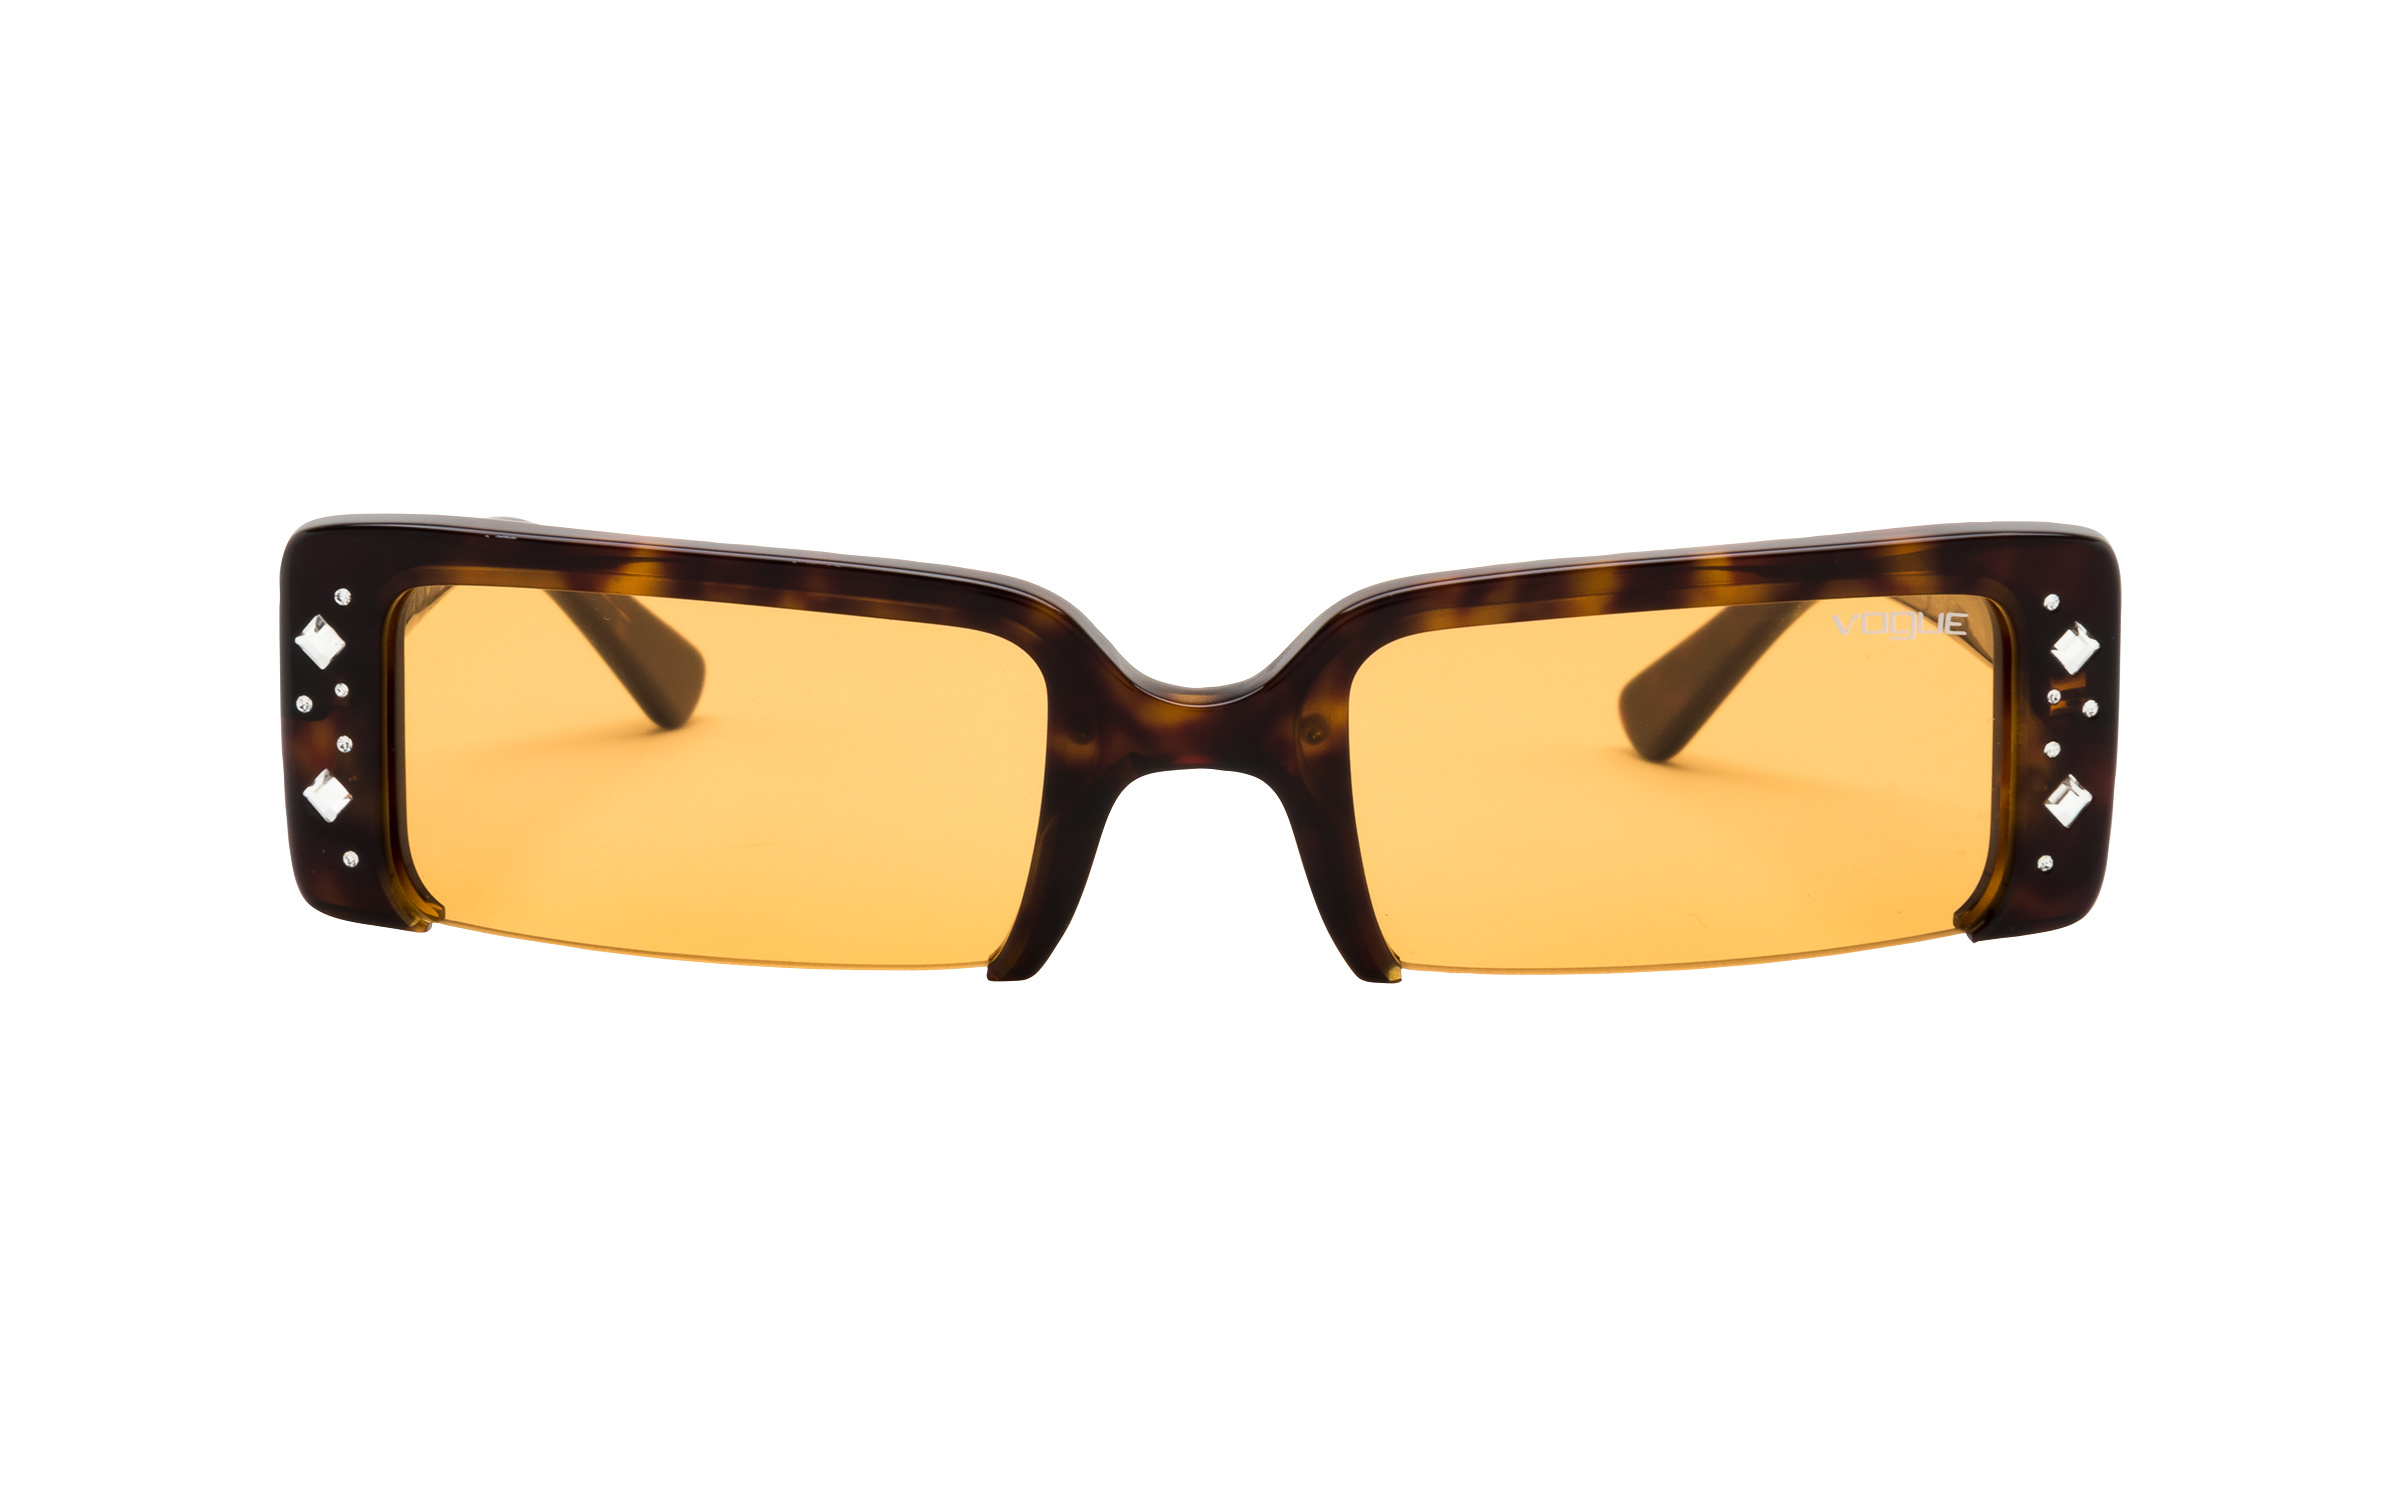 http://www.coastal.com/ - Luxottica Vogue VO5280-SB W656/7 57 Sunglasses in Dark Havana Tortoise – Online Coastal